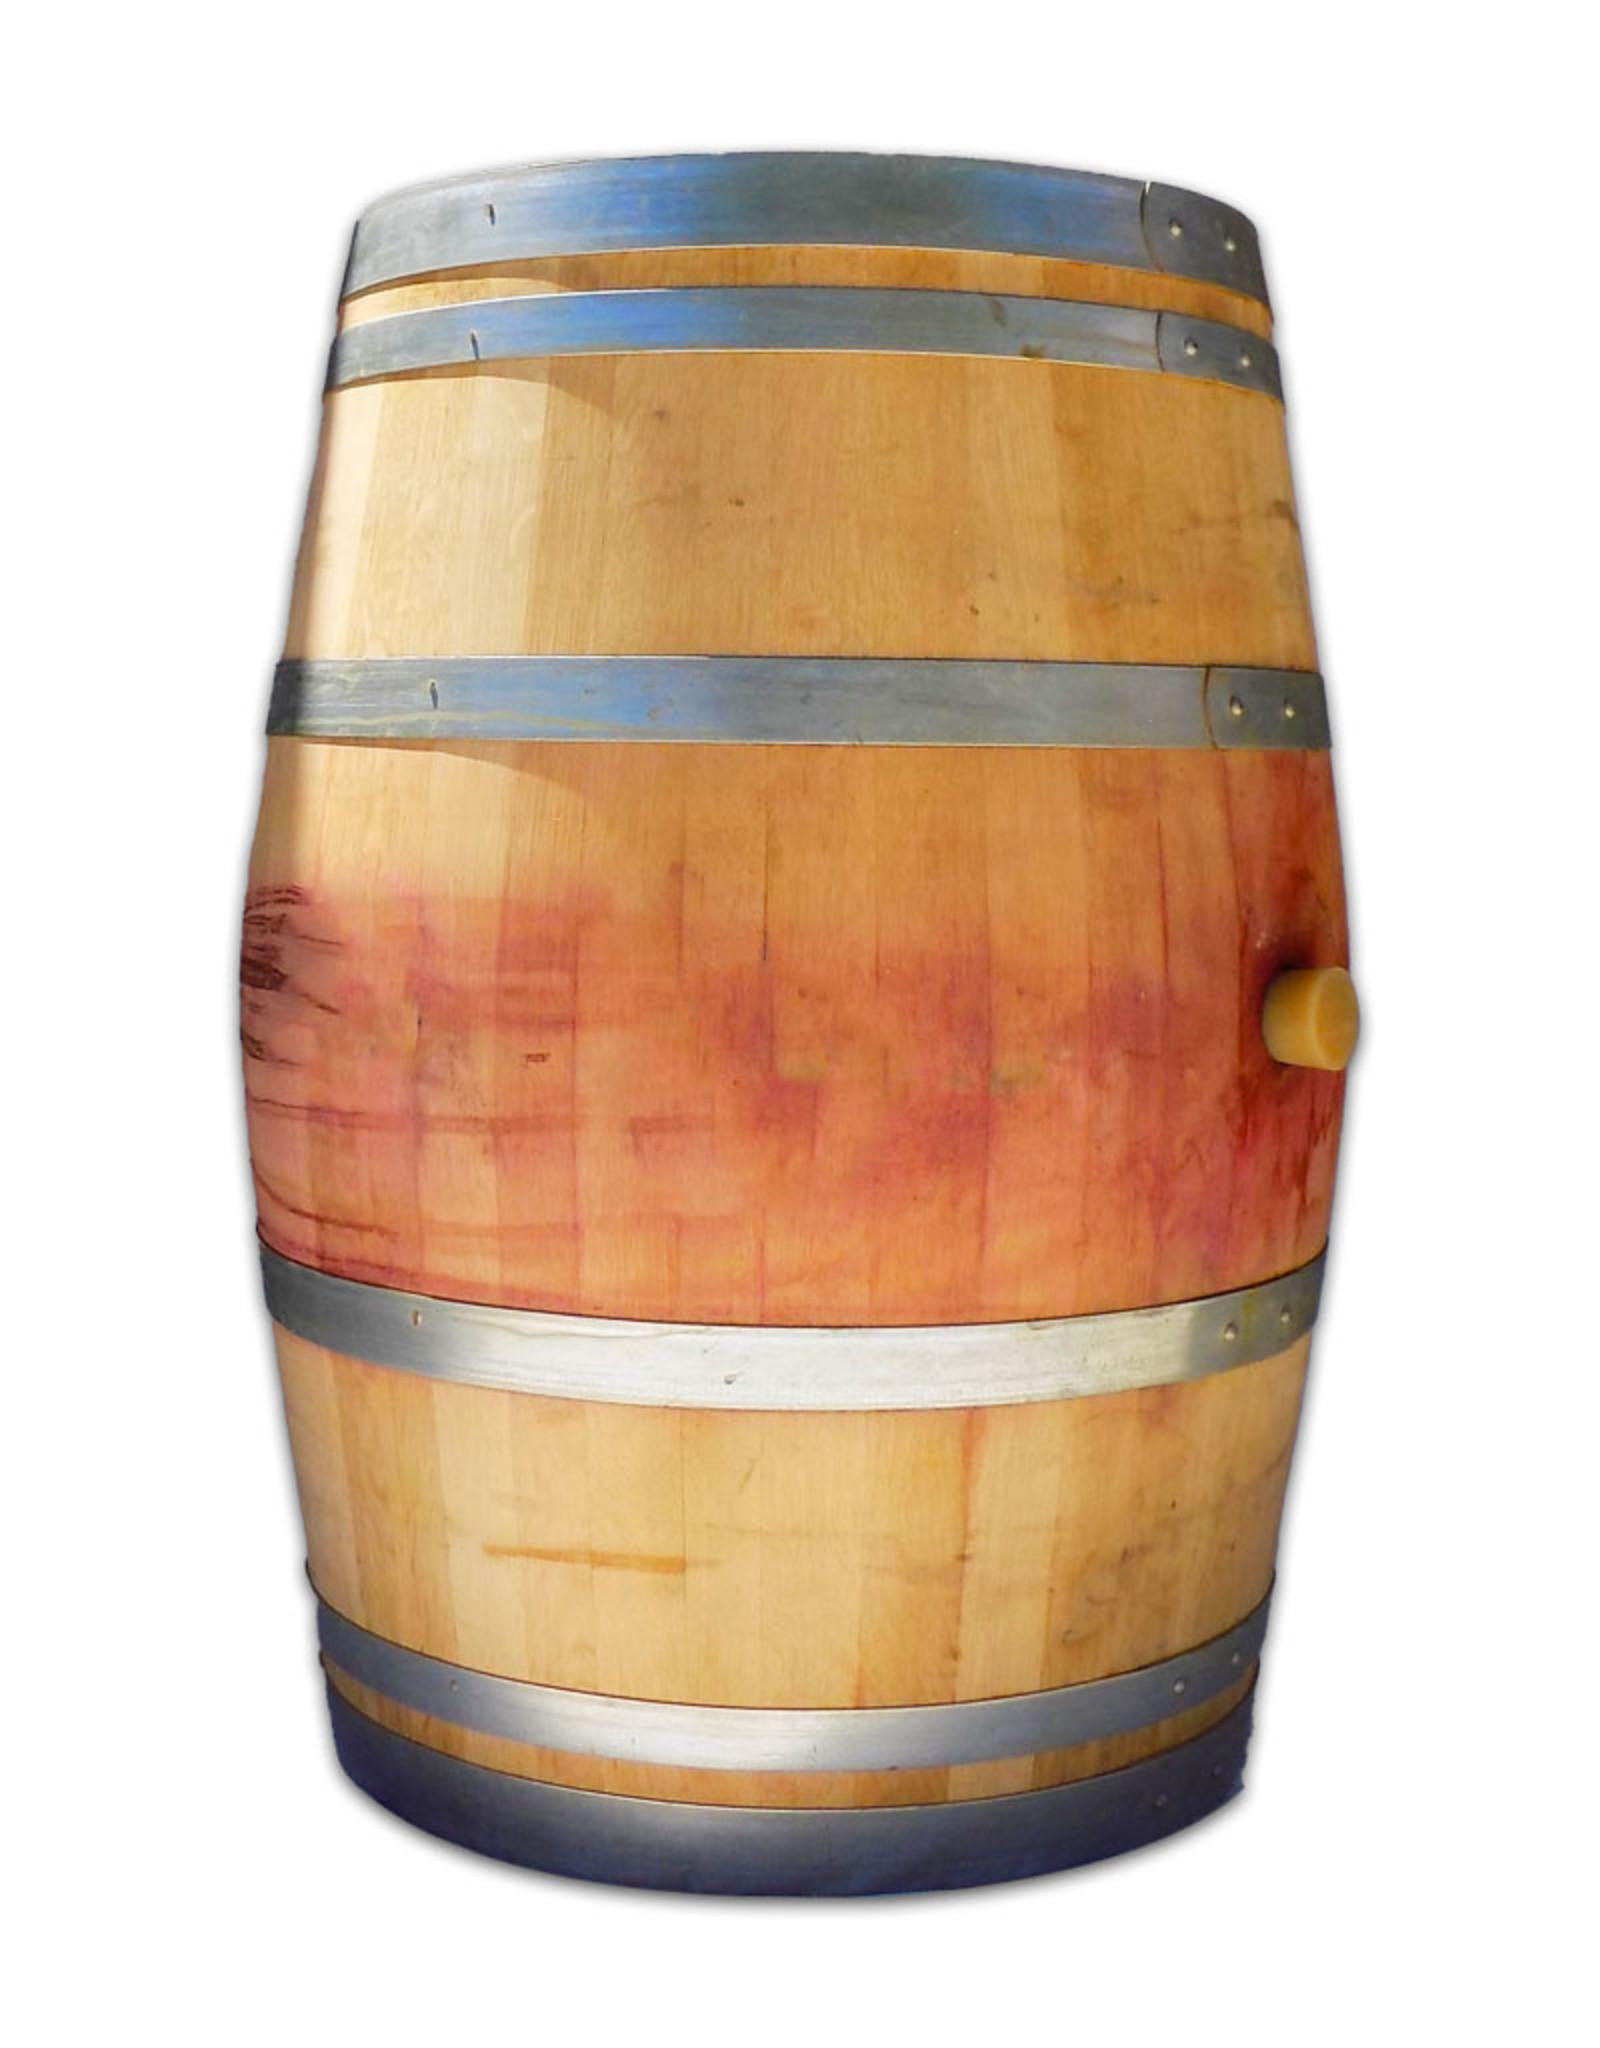 225 L RED WINE BARREL CABERNET / MERLOT